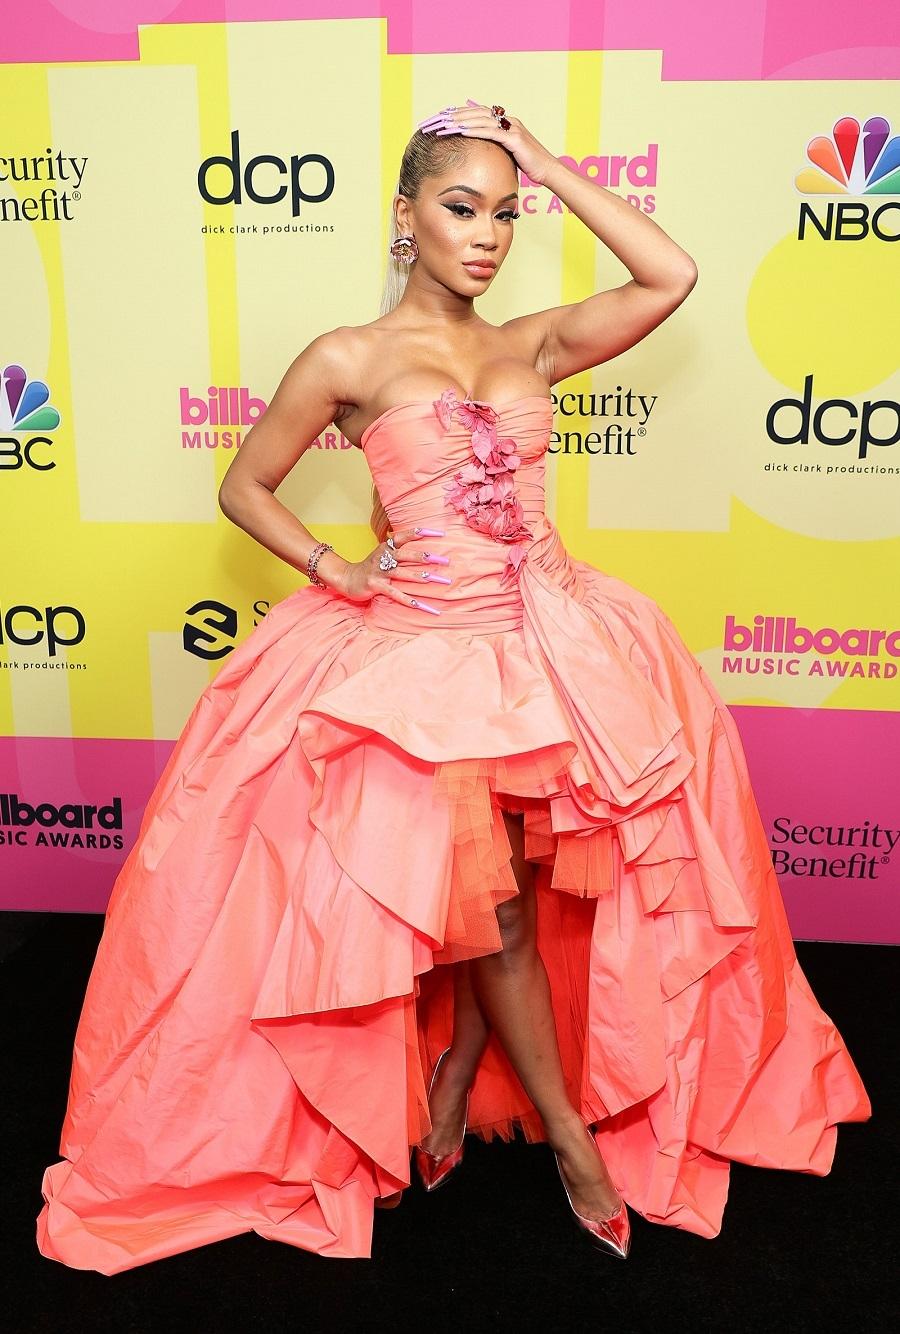 Billboard Music Awards 2021: Меган Фокс, Приянка Чопра, P!nk и другие на красной дорожке премии (ФОТО) - фото №8